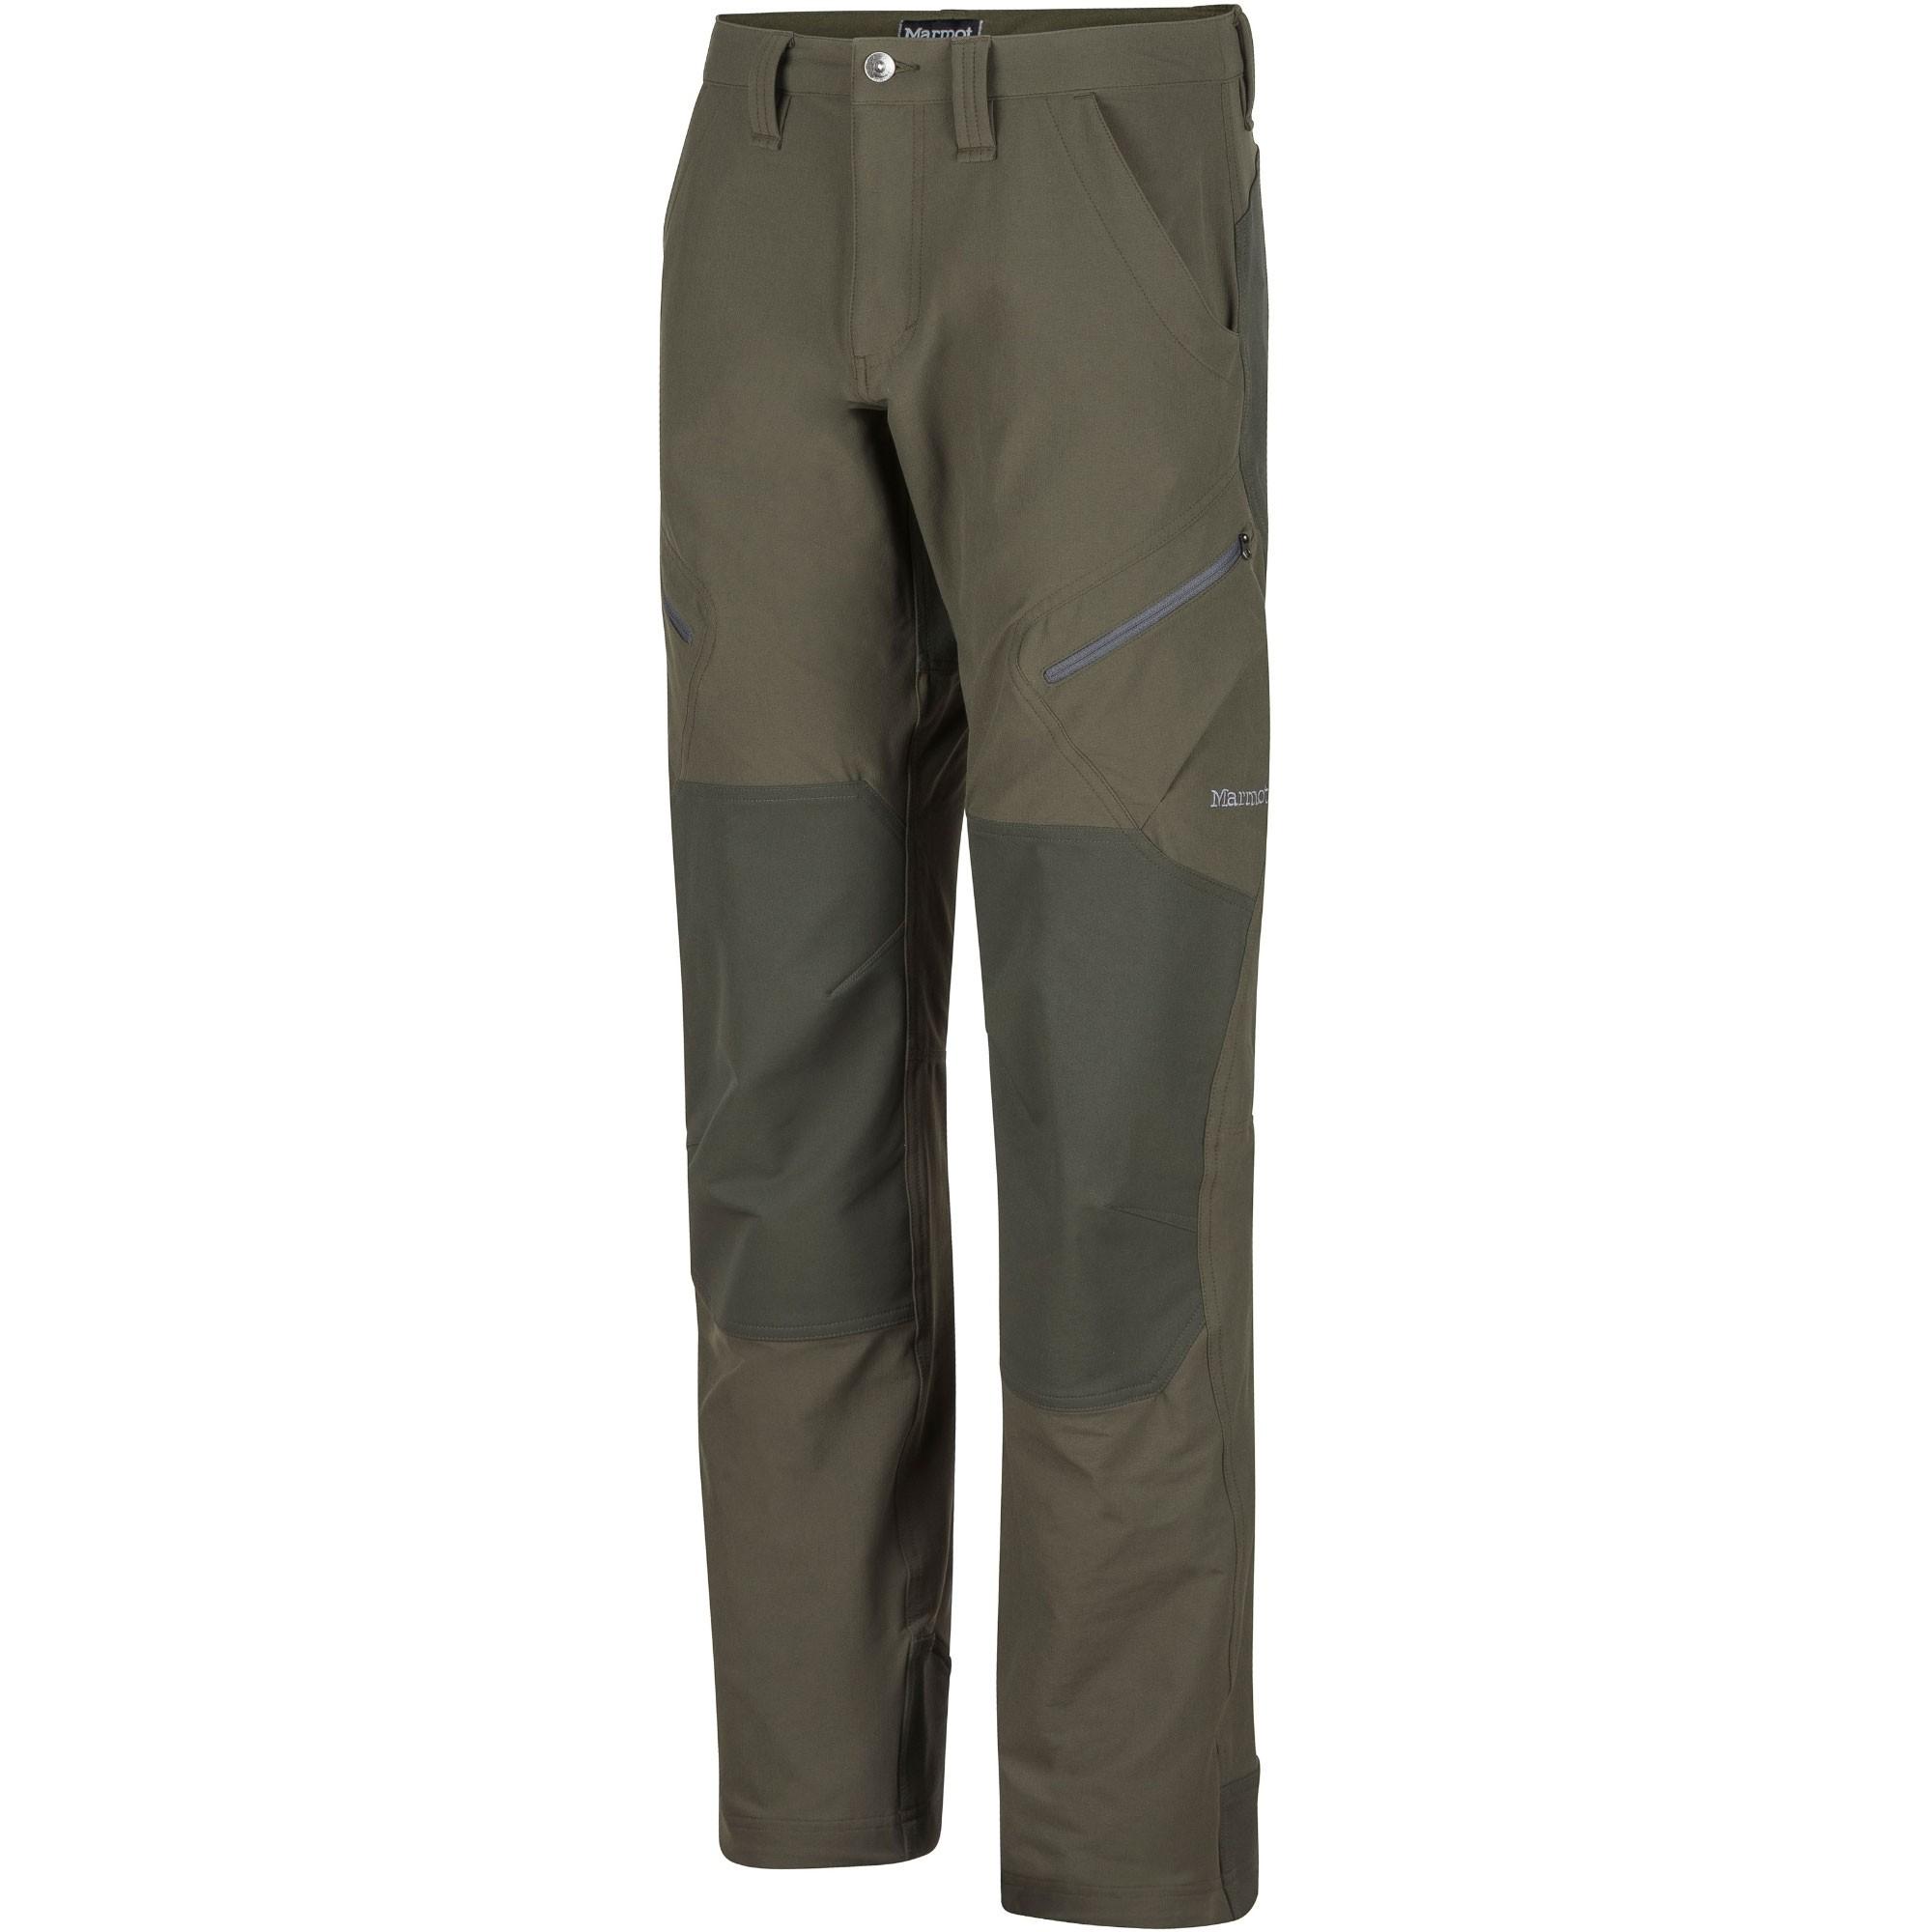 Marmot Highland Men's Softshell Pants - Forest Night/Rosin Green